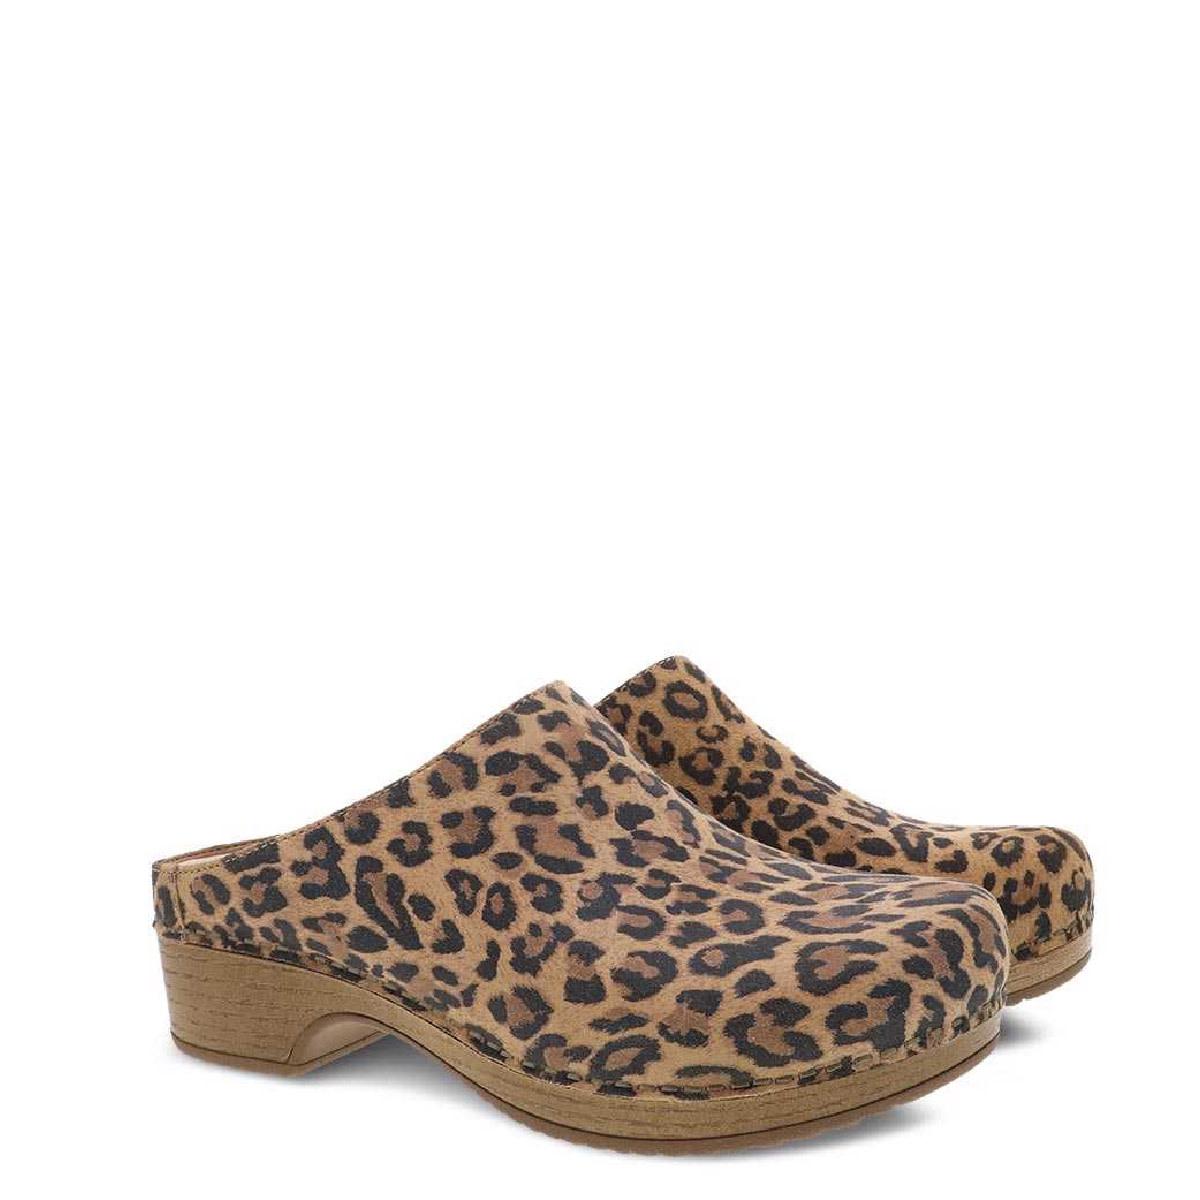 Dansko Dansko Brenda Leopard Suede